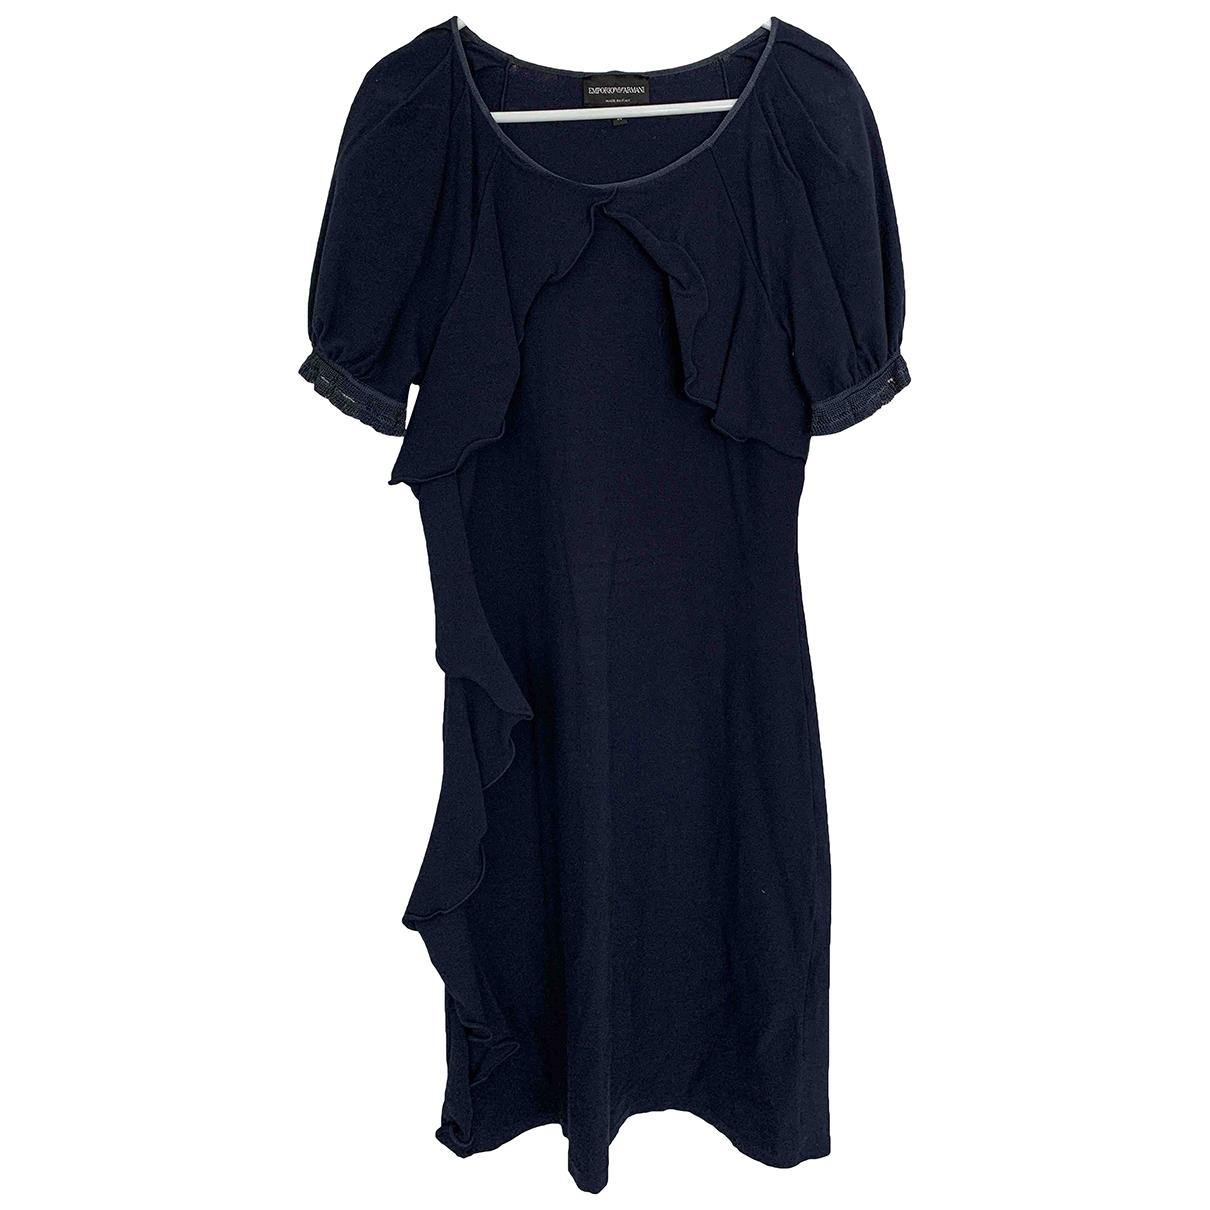 Emporio Armani \N Blue dress for Women 44 IT